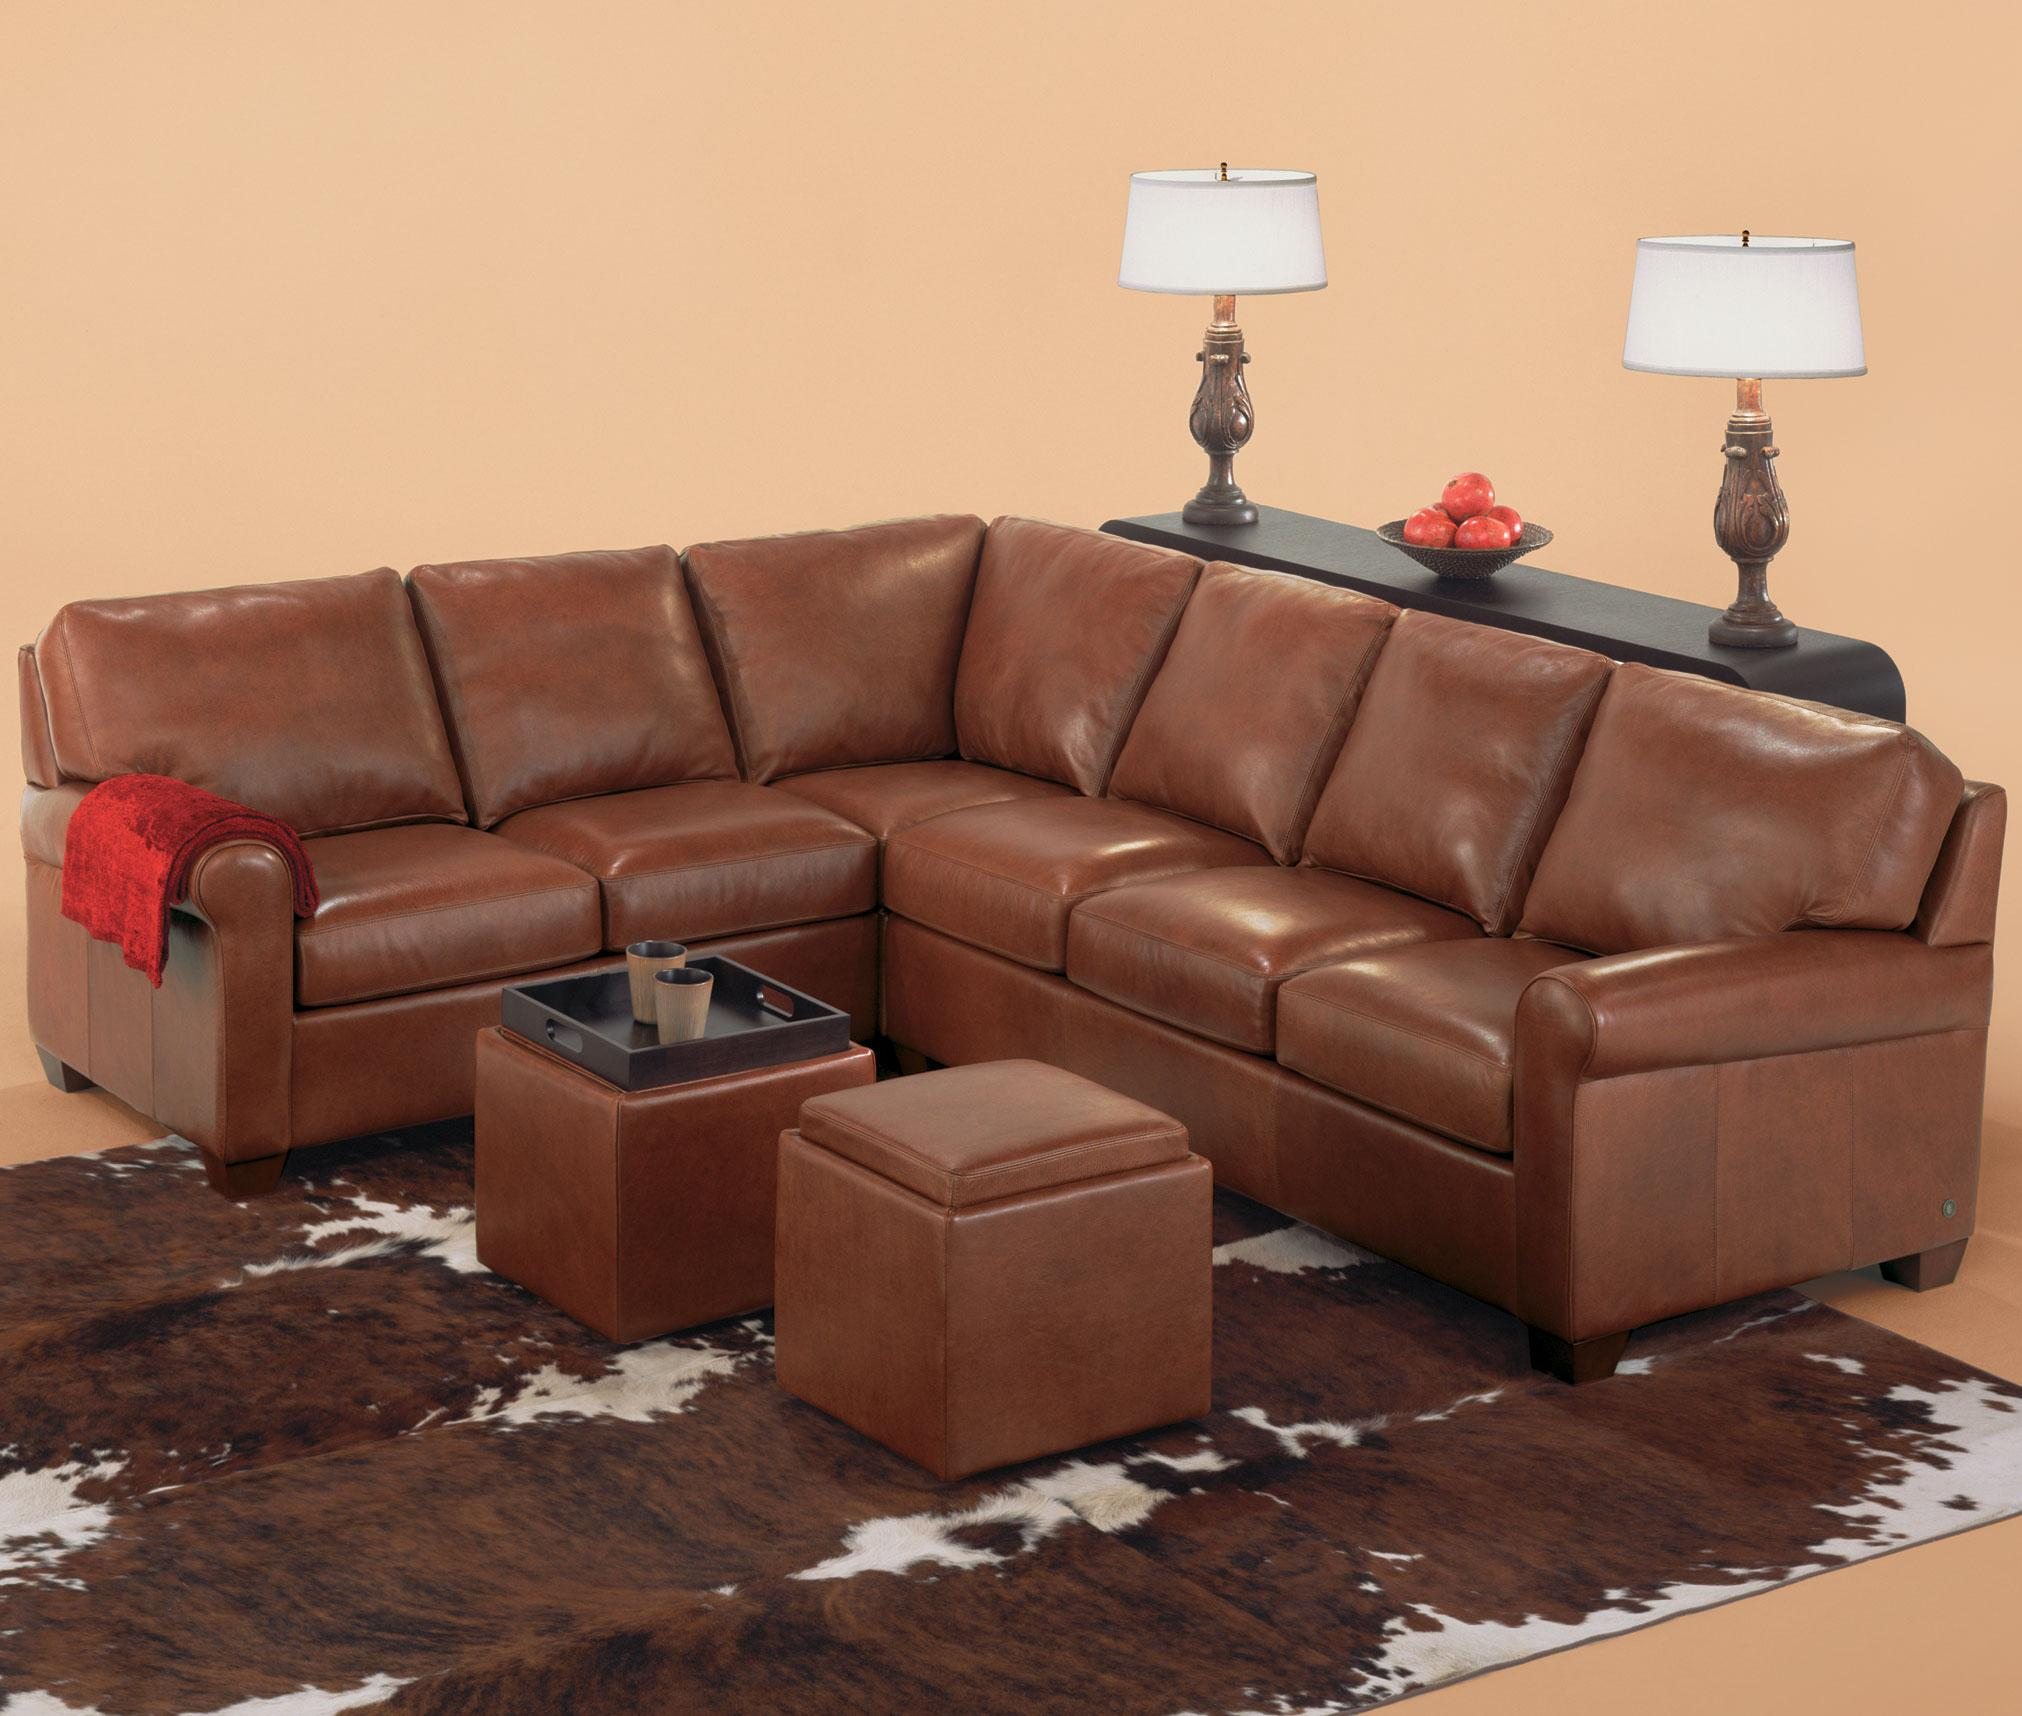 savoy leather sofa costco review set photos rh thesofa